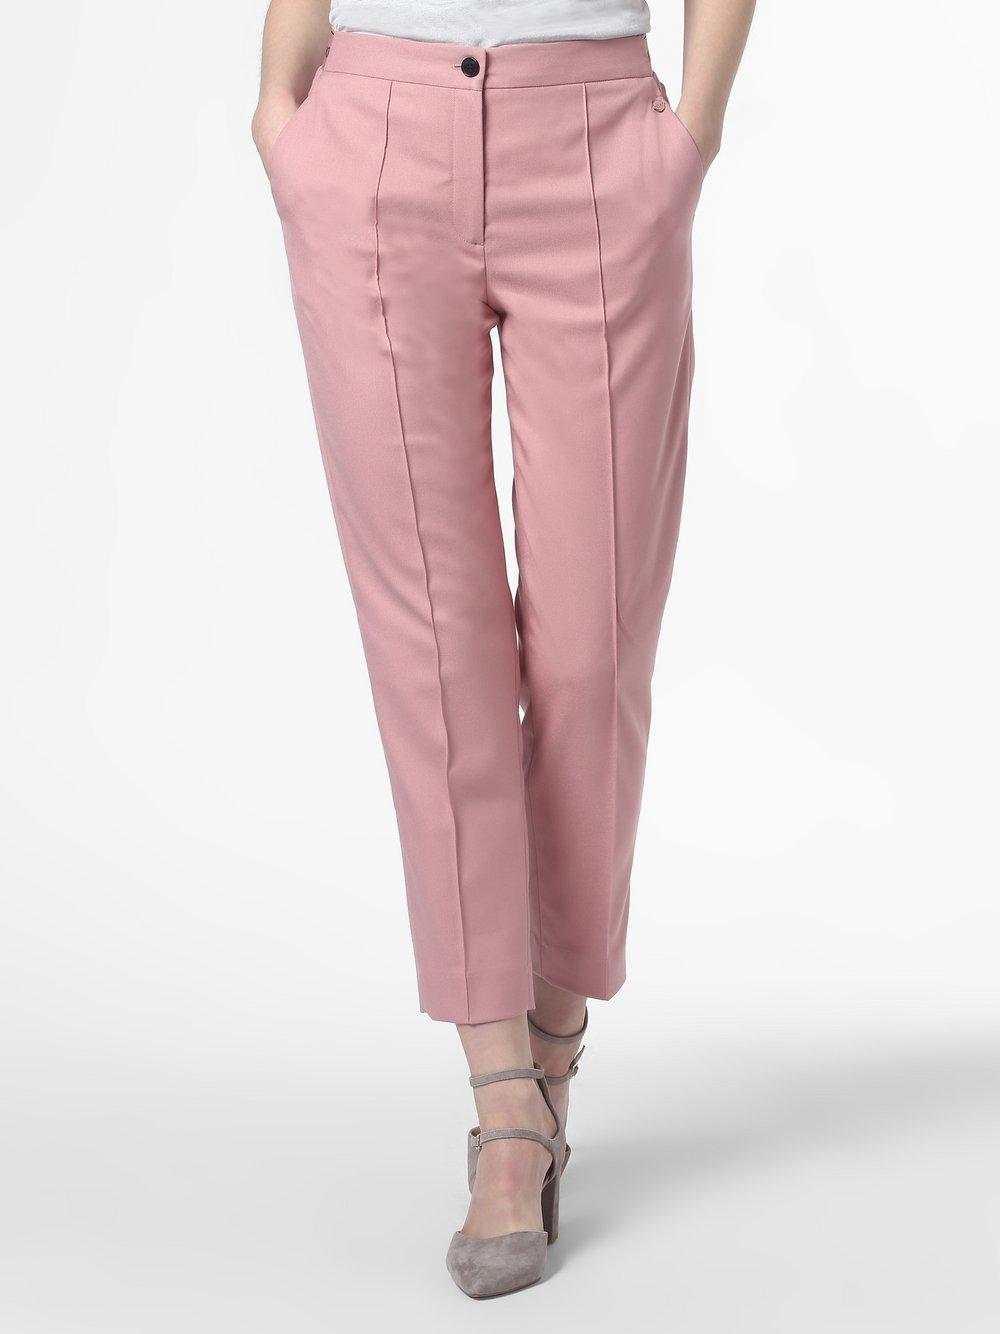 Calvin Klein - Spodnie damskie, różowy